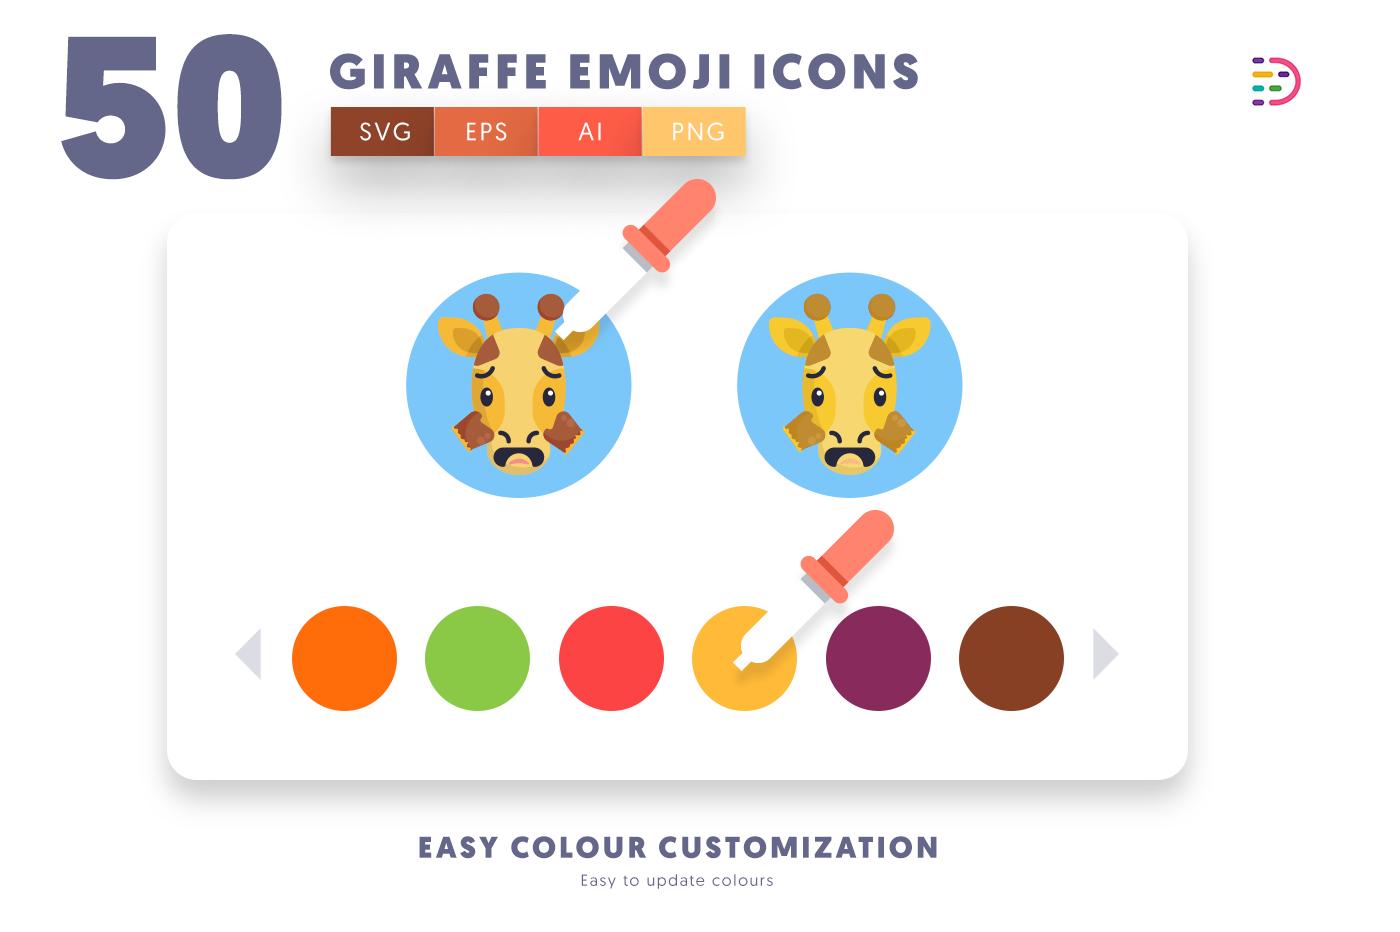 Customizable and vector 50 Giraffe Emoji Icons